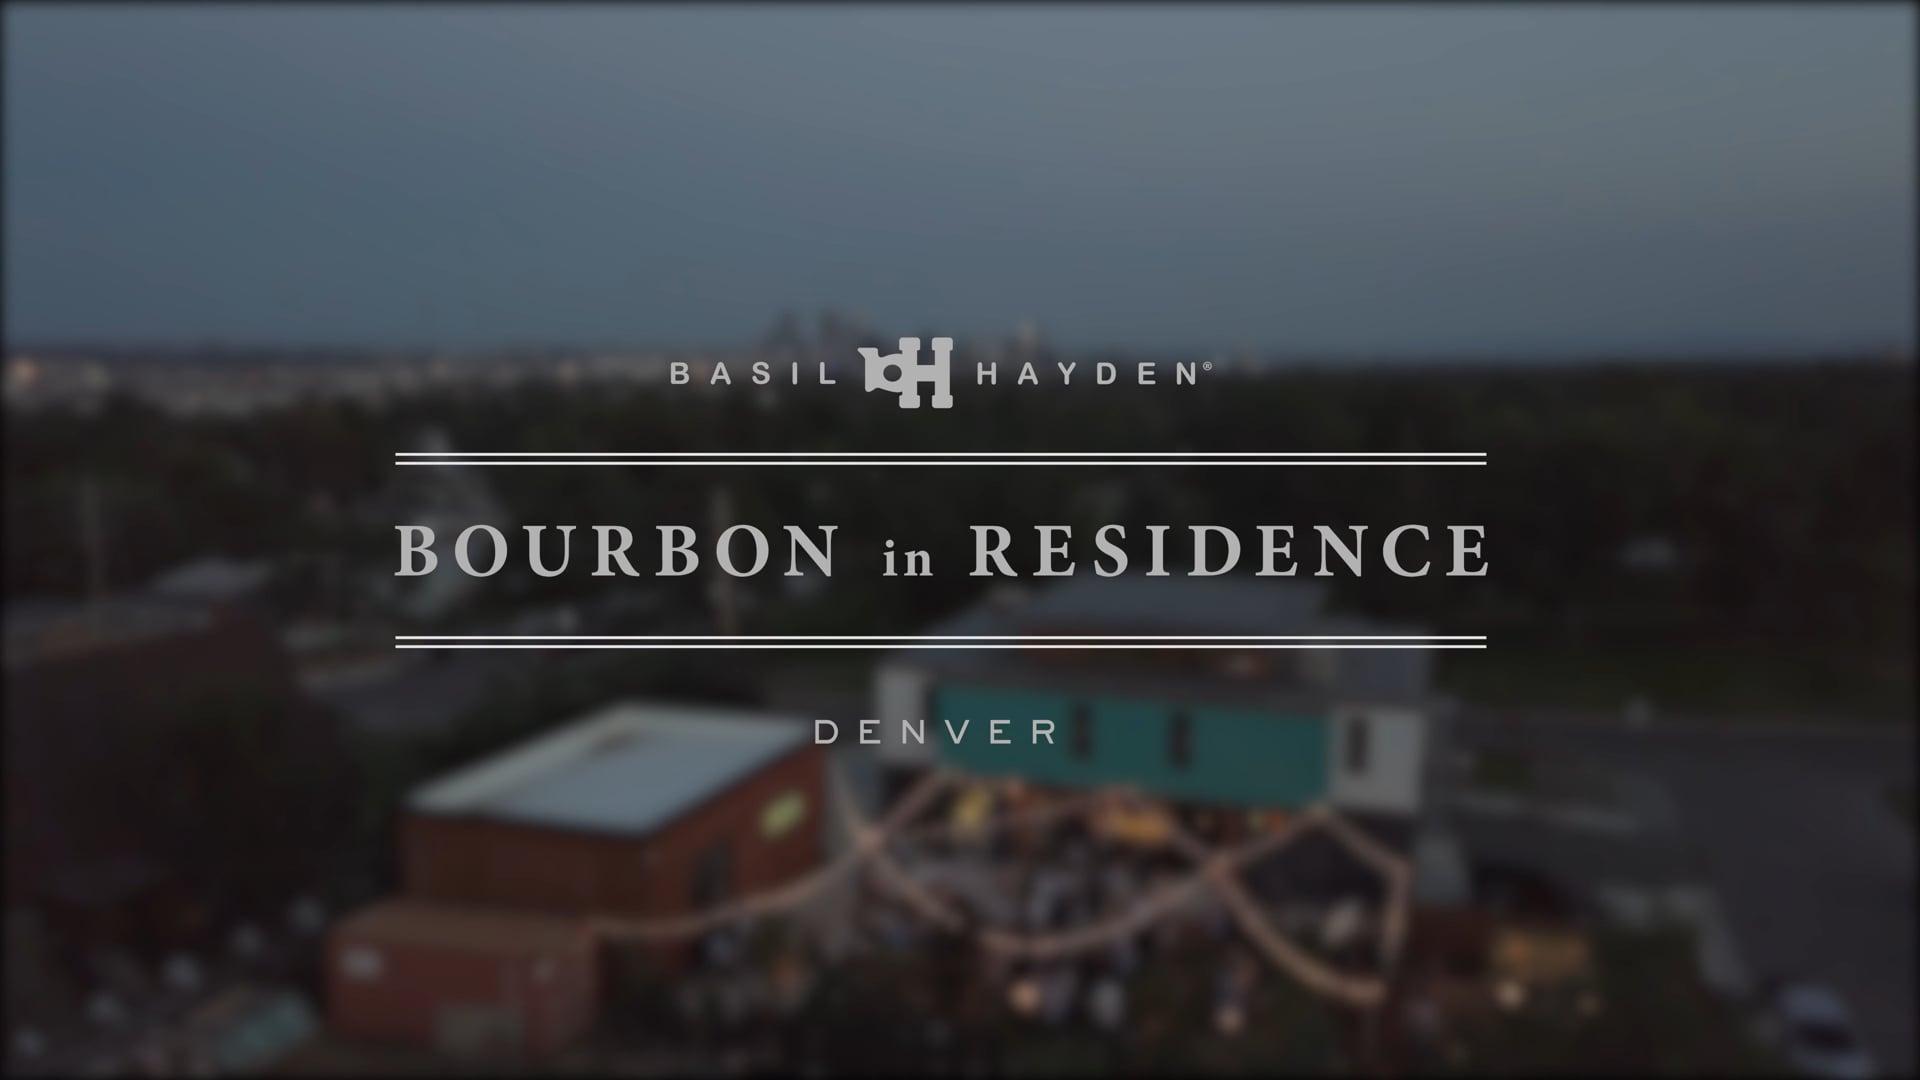 Promoción Basil Hayden's Bourbon In Residence   Denver 2018  Gradient Experiential   USA